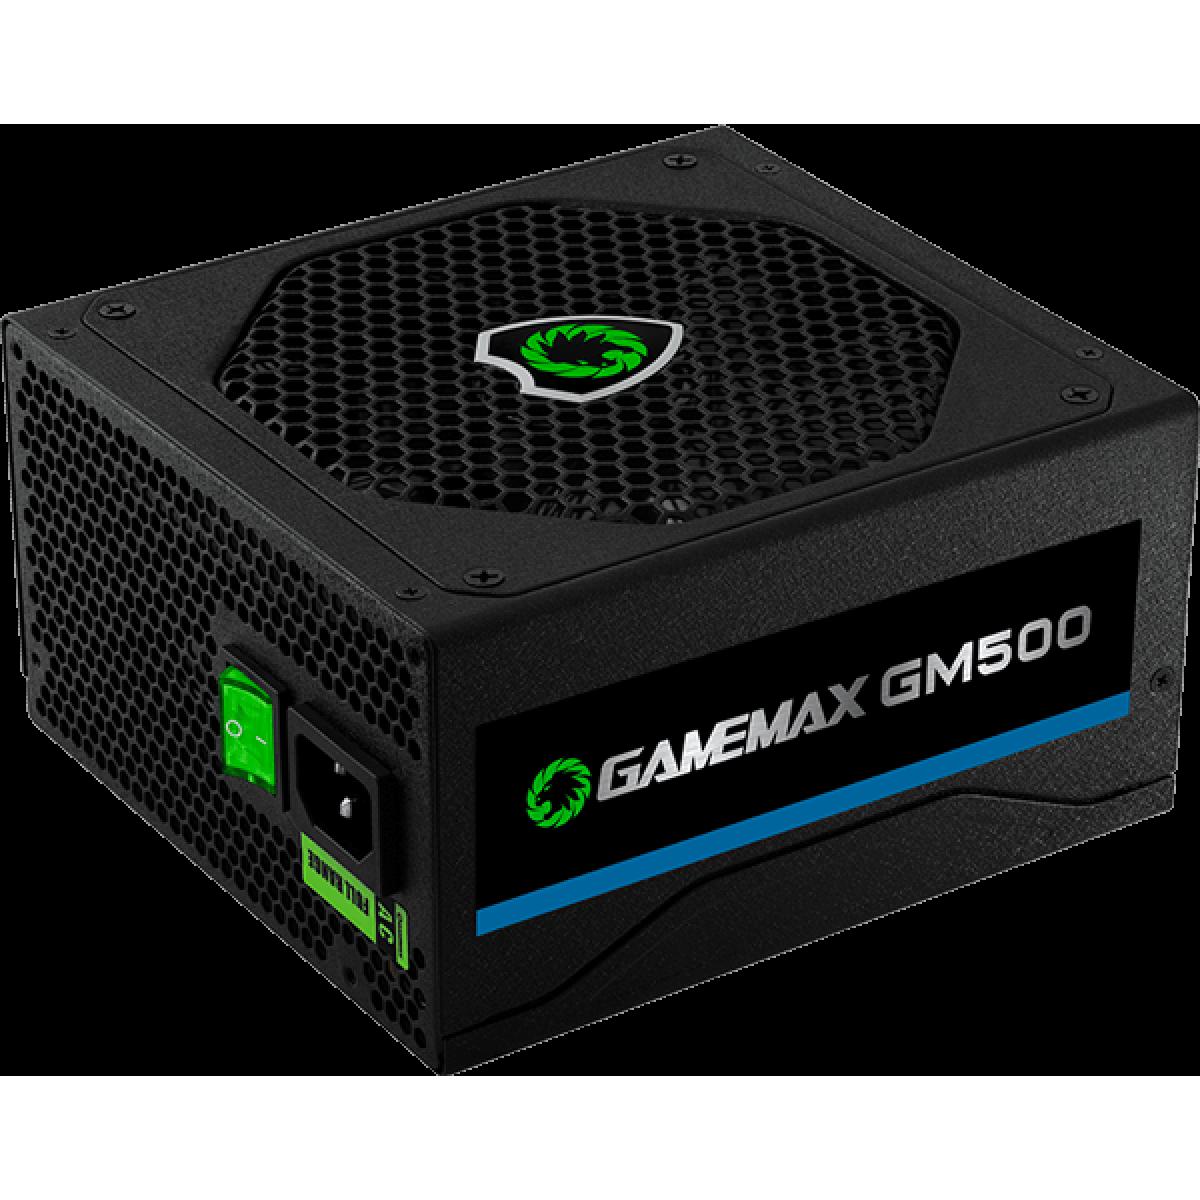 Fonte Gamemax GM500 500W, 80 Plus Bronze, PFC Ativo, OEM, sem caixa.